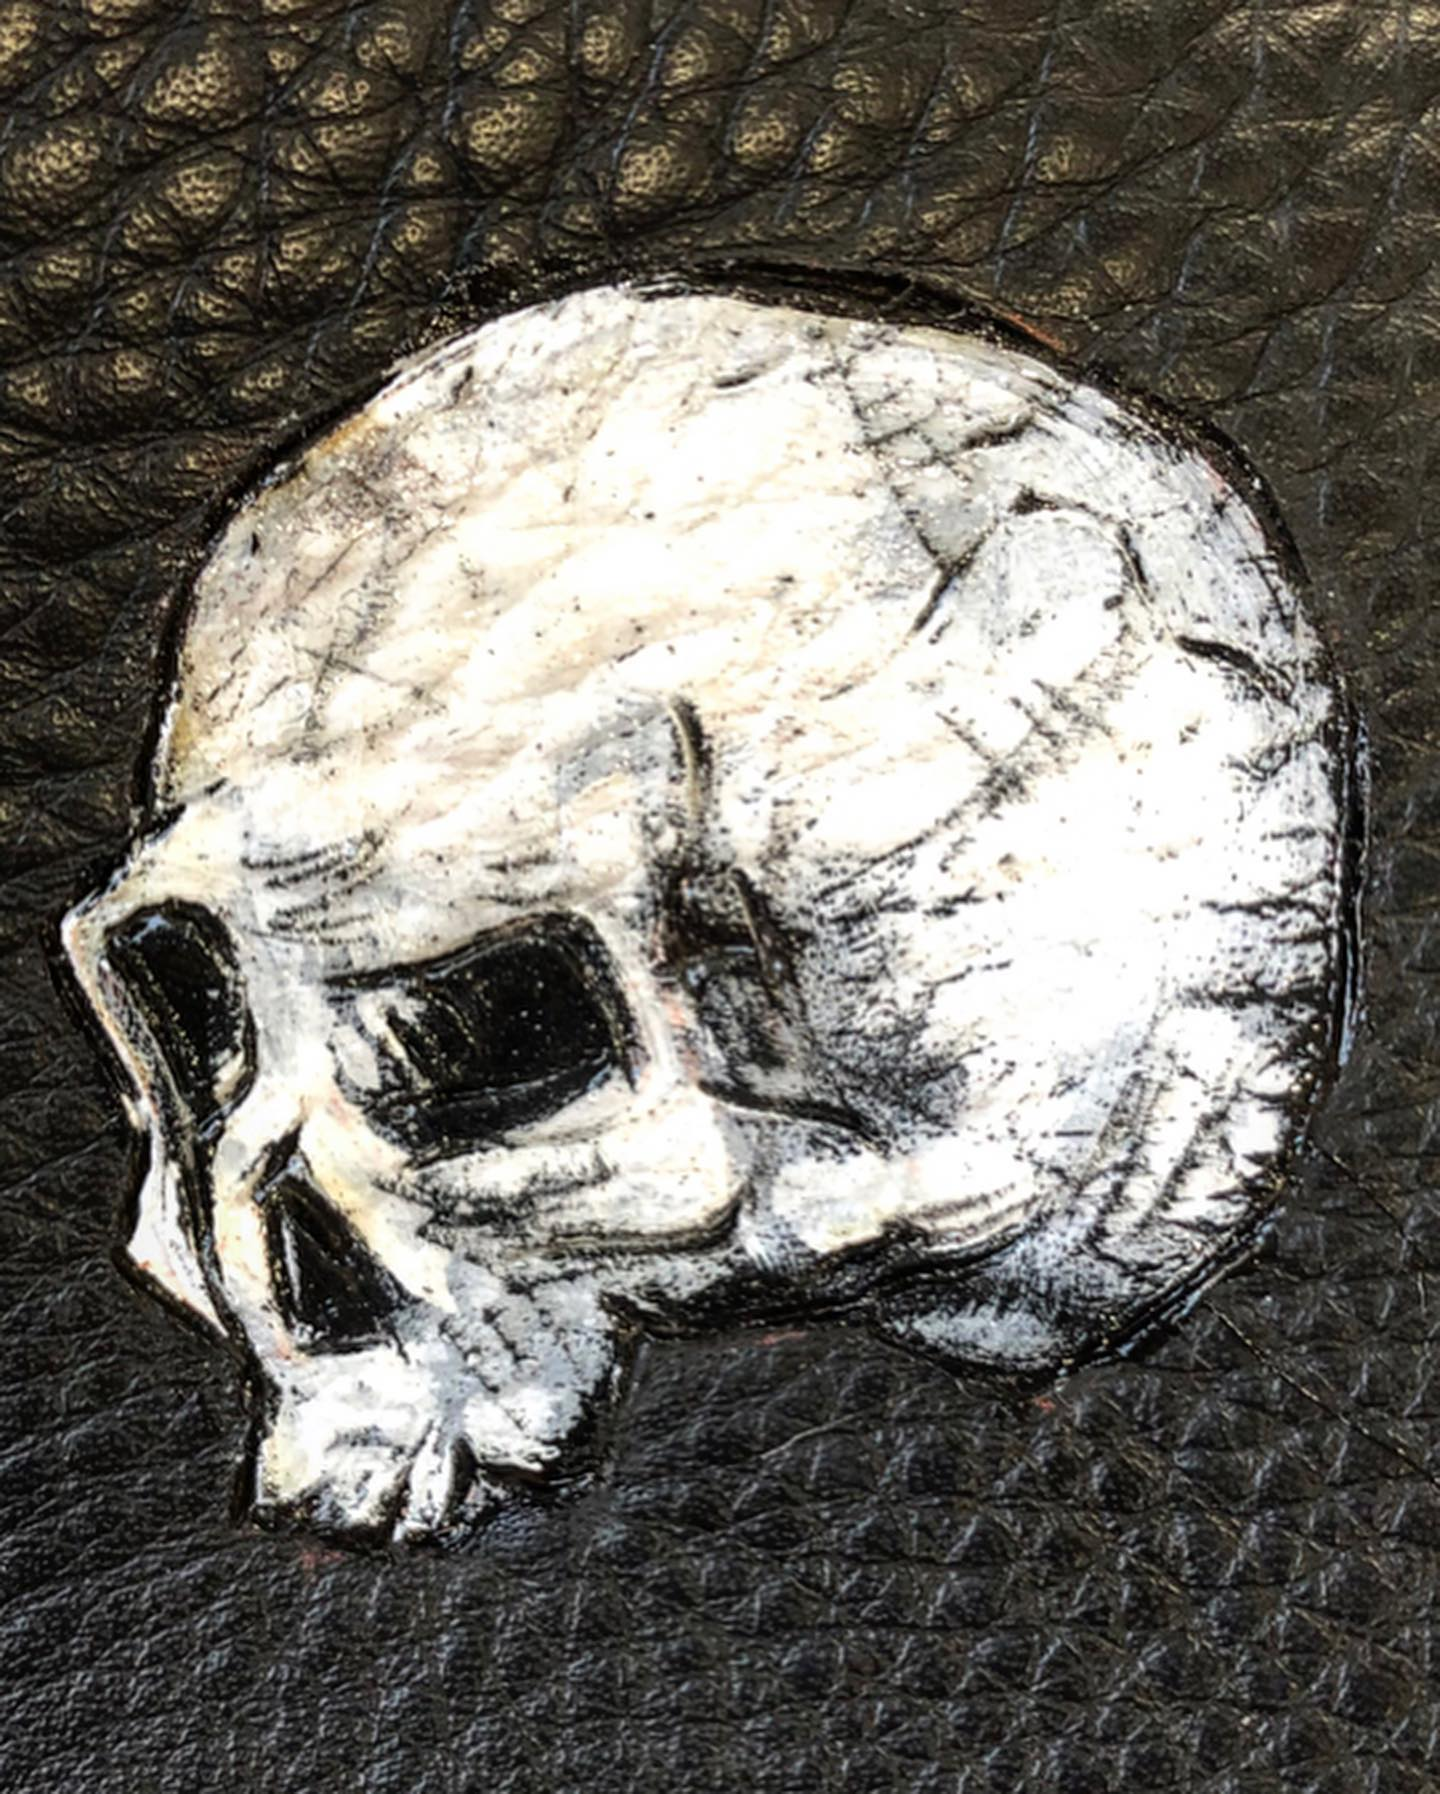 sketchy-drawn-skull-white-black-leather-art-burnwizard